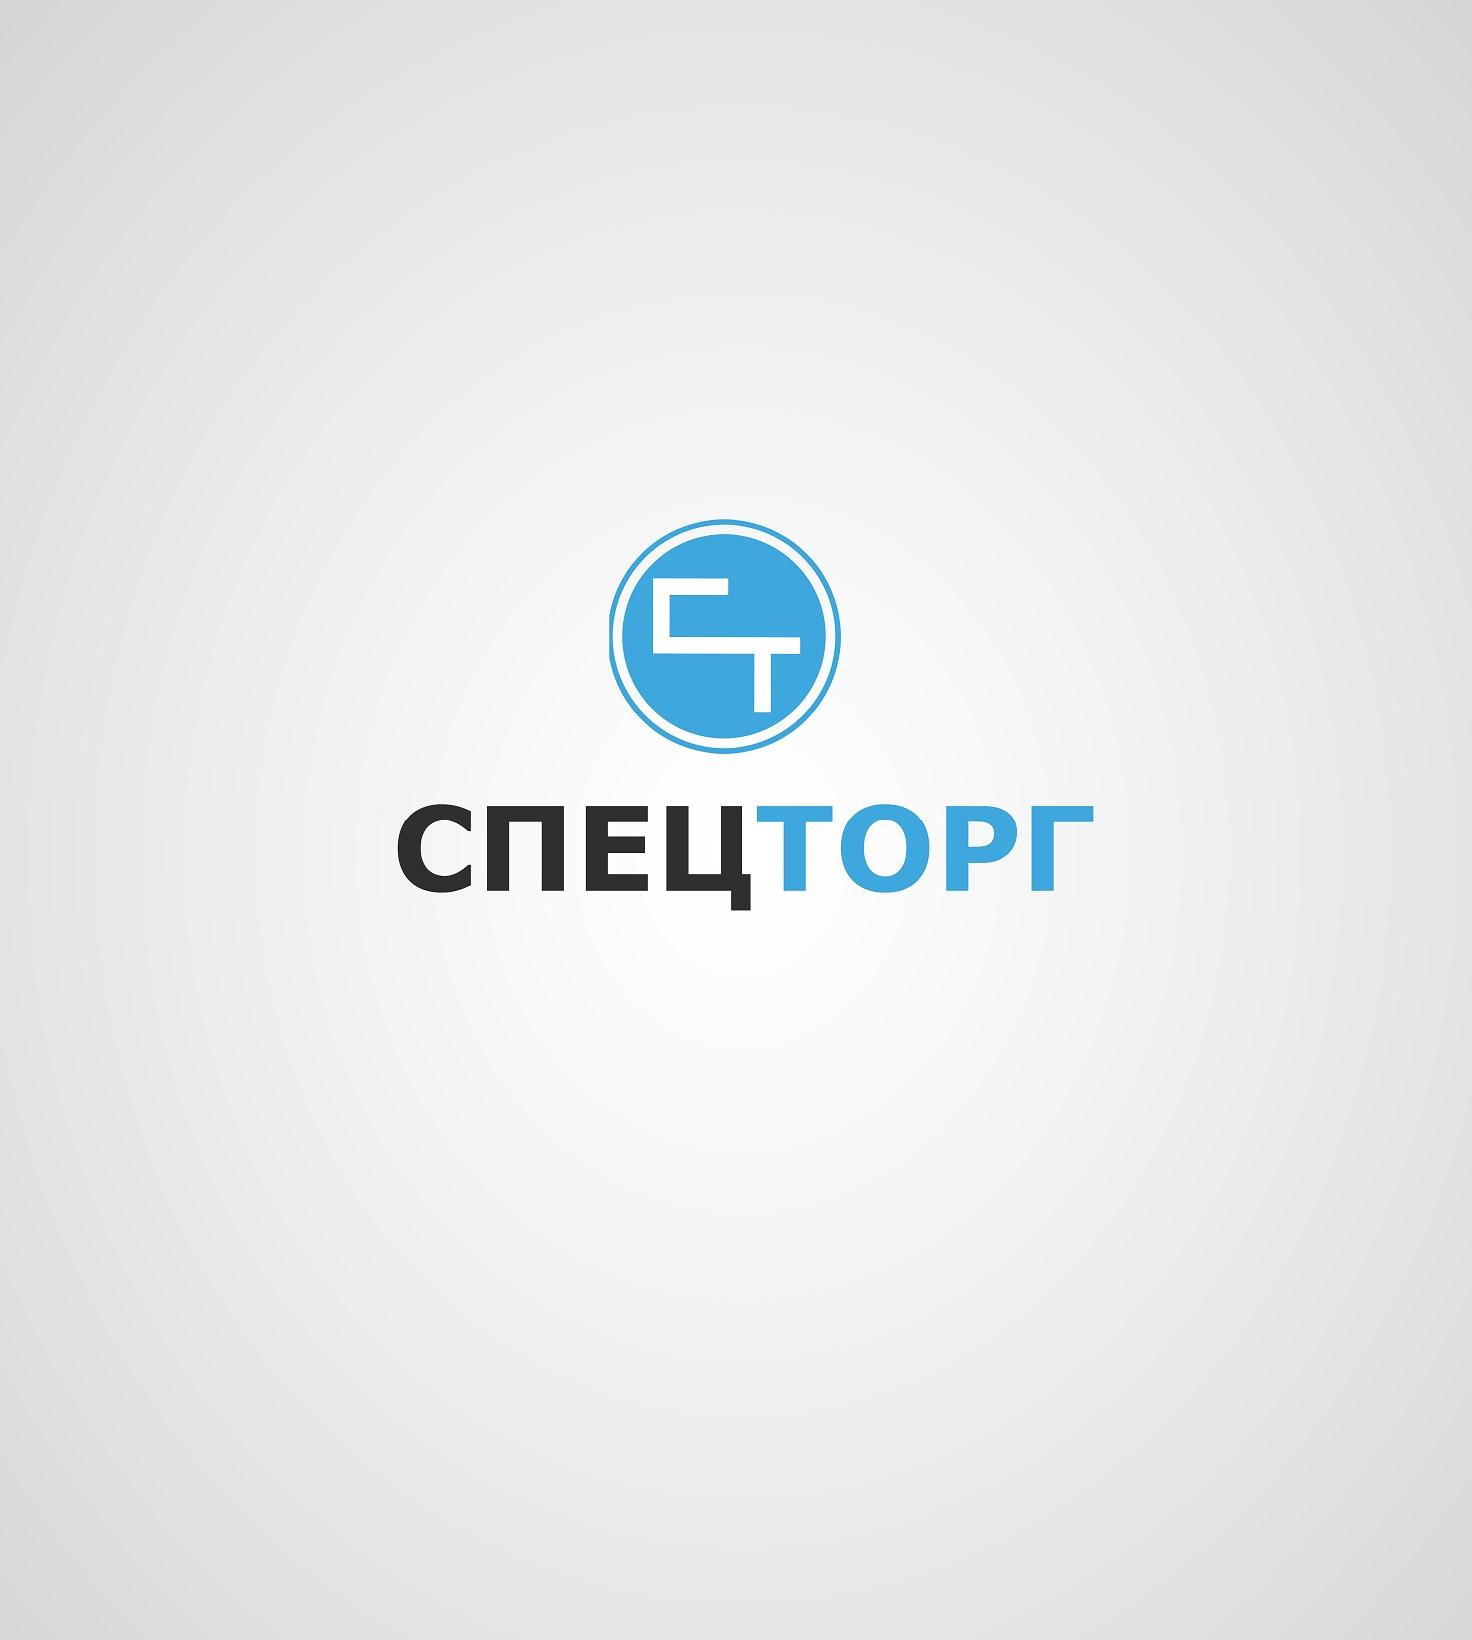 Разработать дизайн  логотипа компании фото f_4555dc94ab367b33.jpg